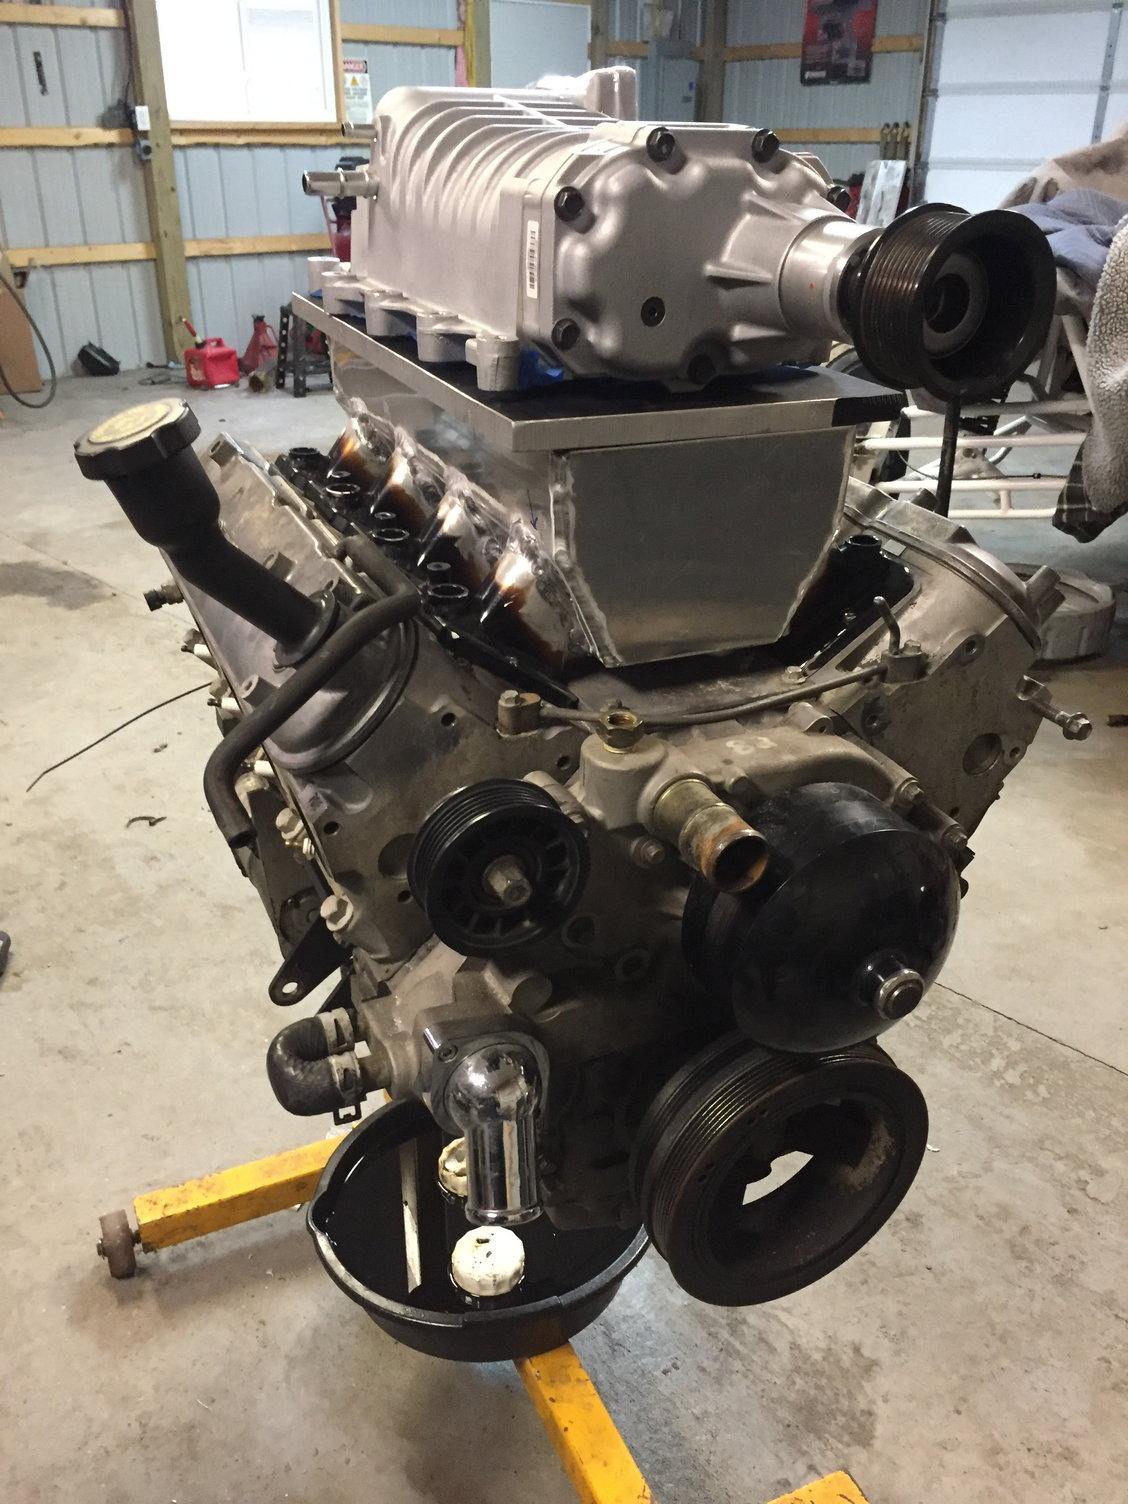 5 3 E85 Eaton M122 12psi Custom Intake On A Budget